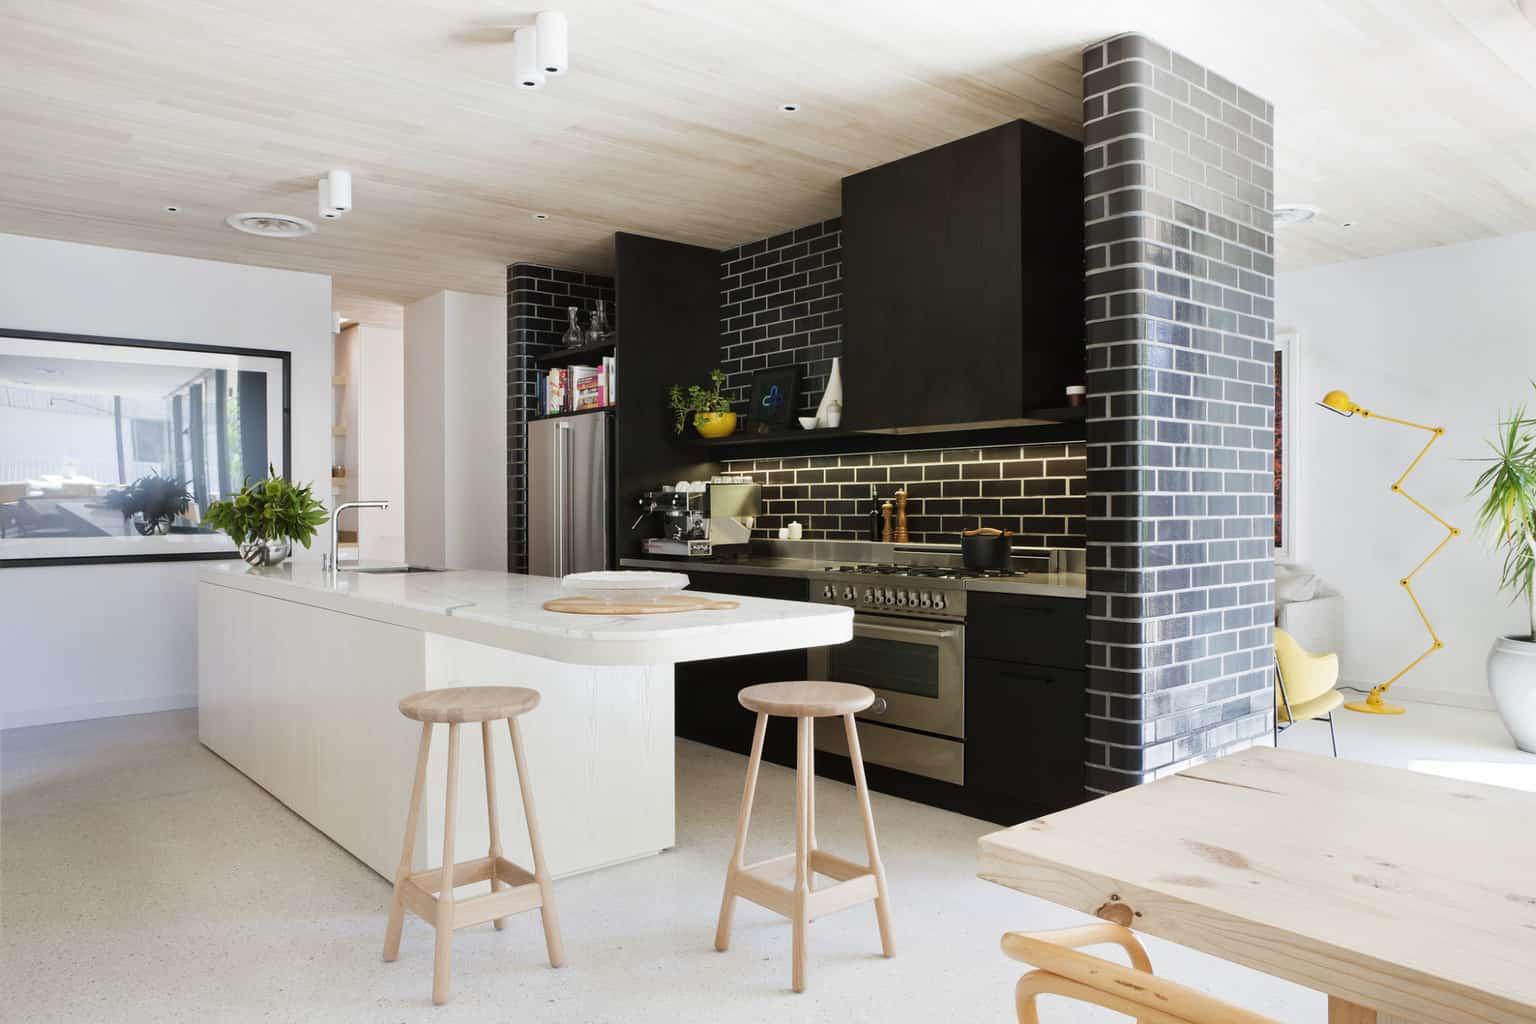 2012 Houses Awards: Brick house